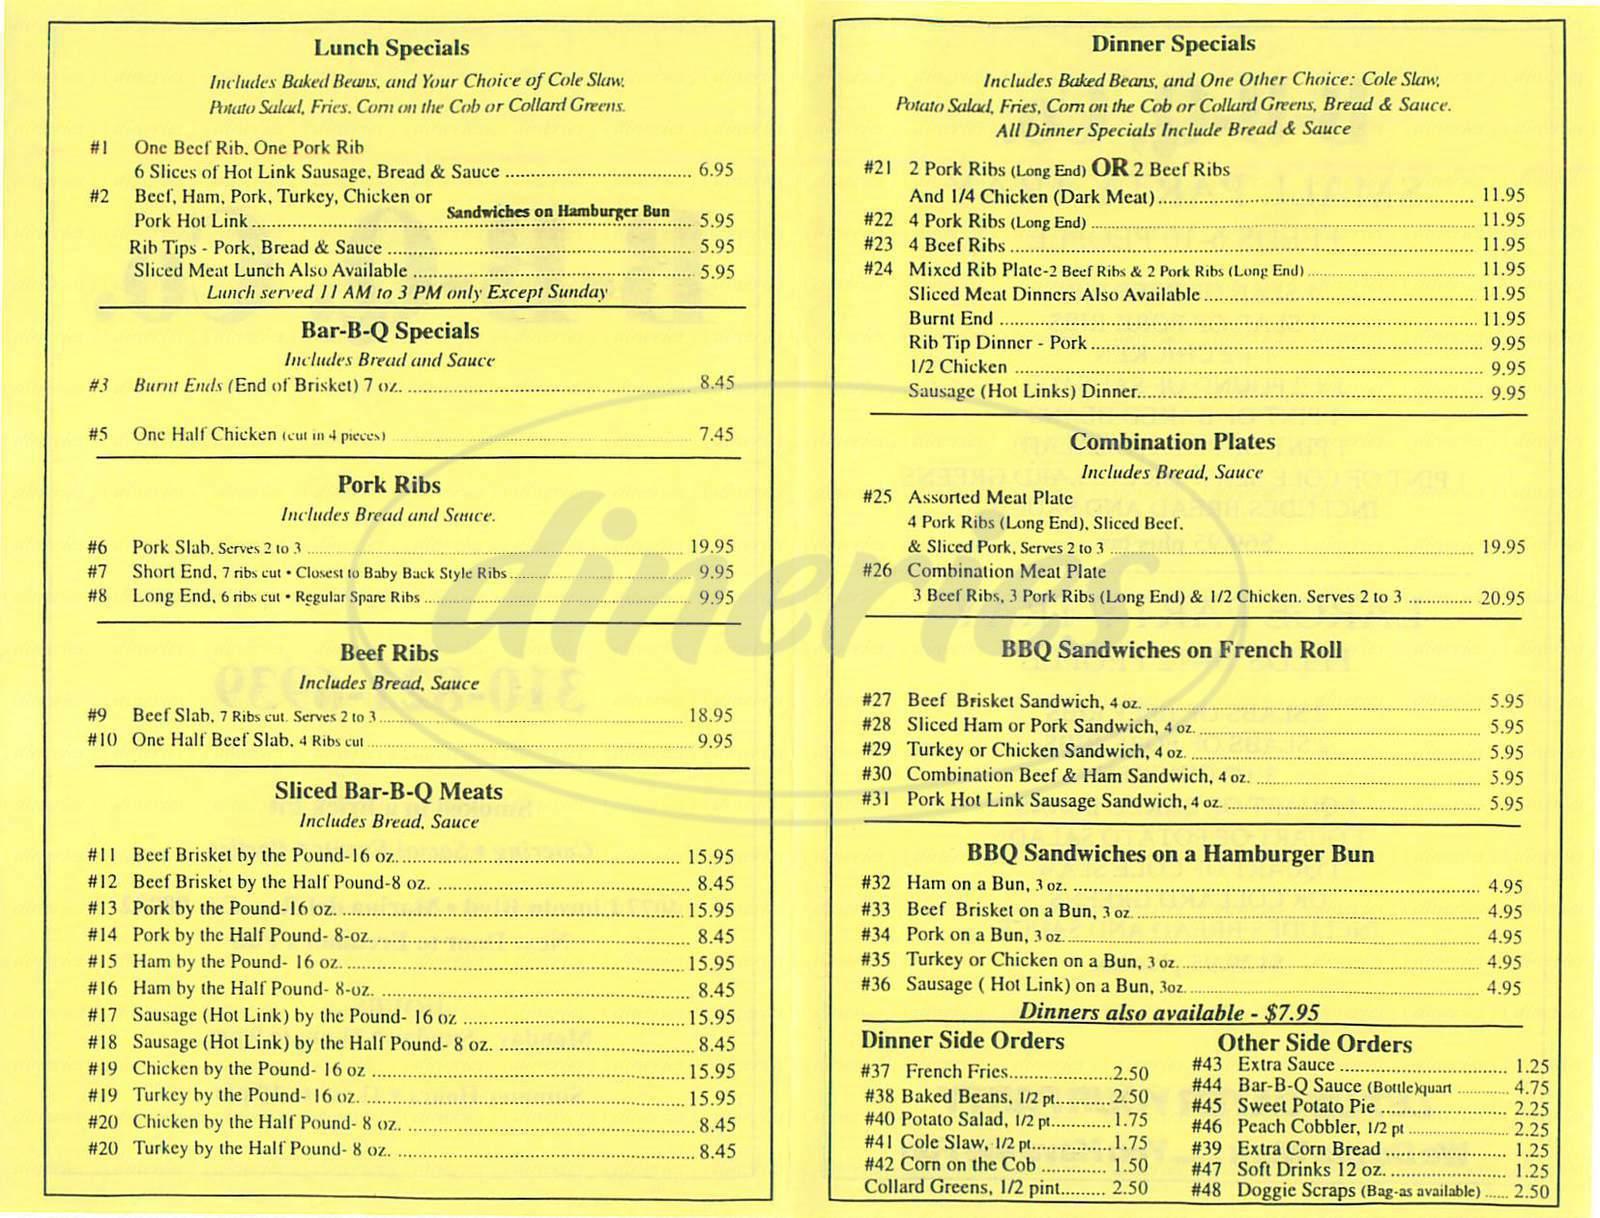 menu for Bennys Bar-B-Q